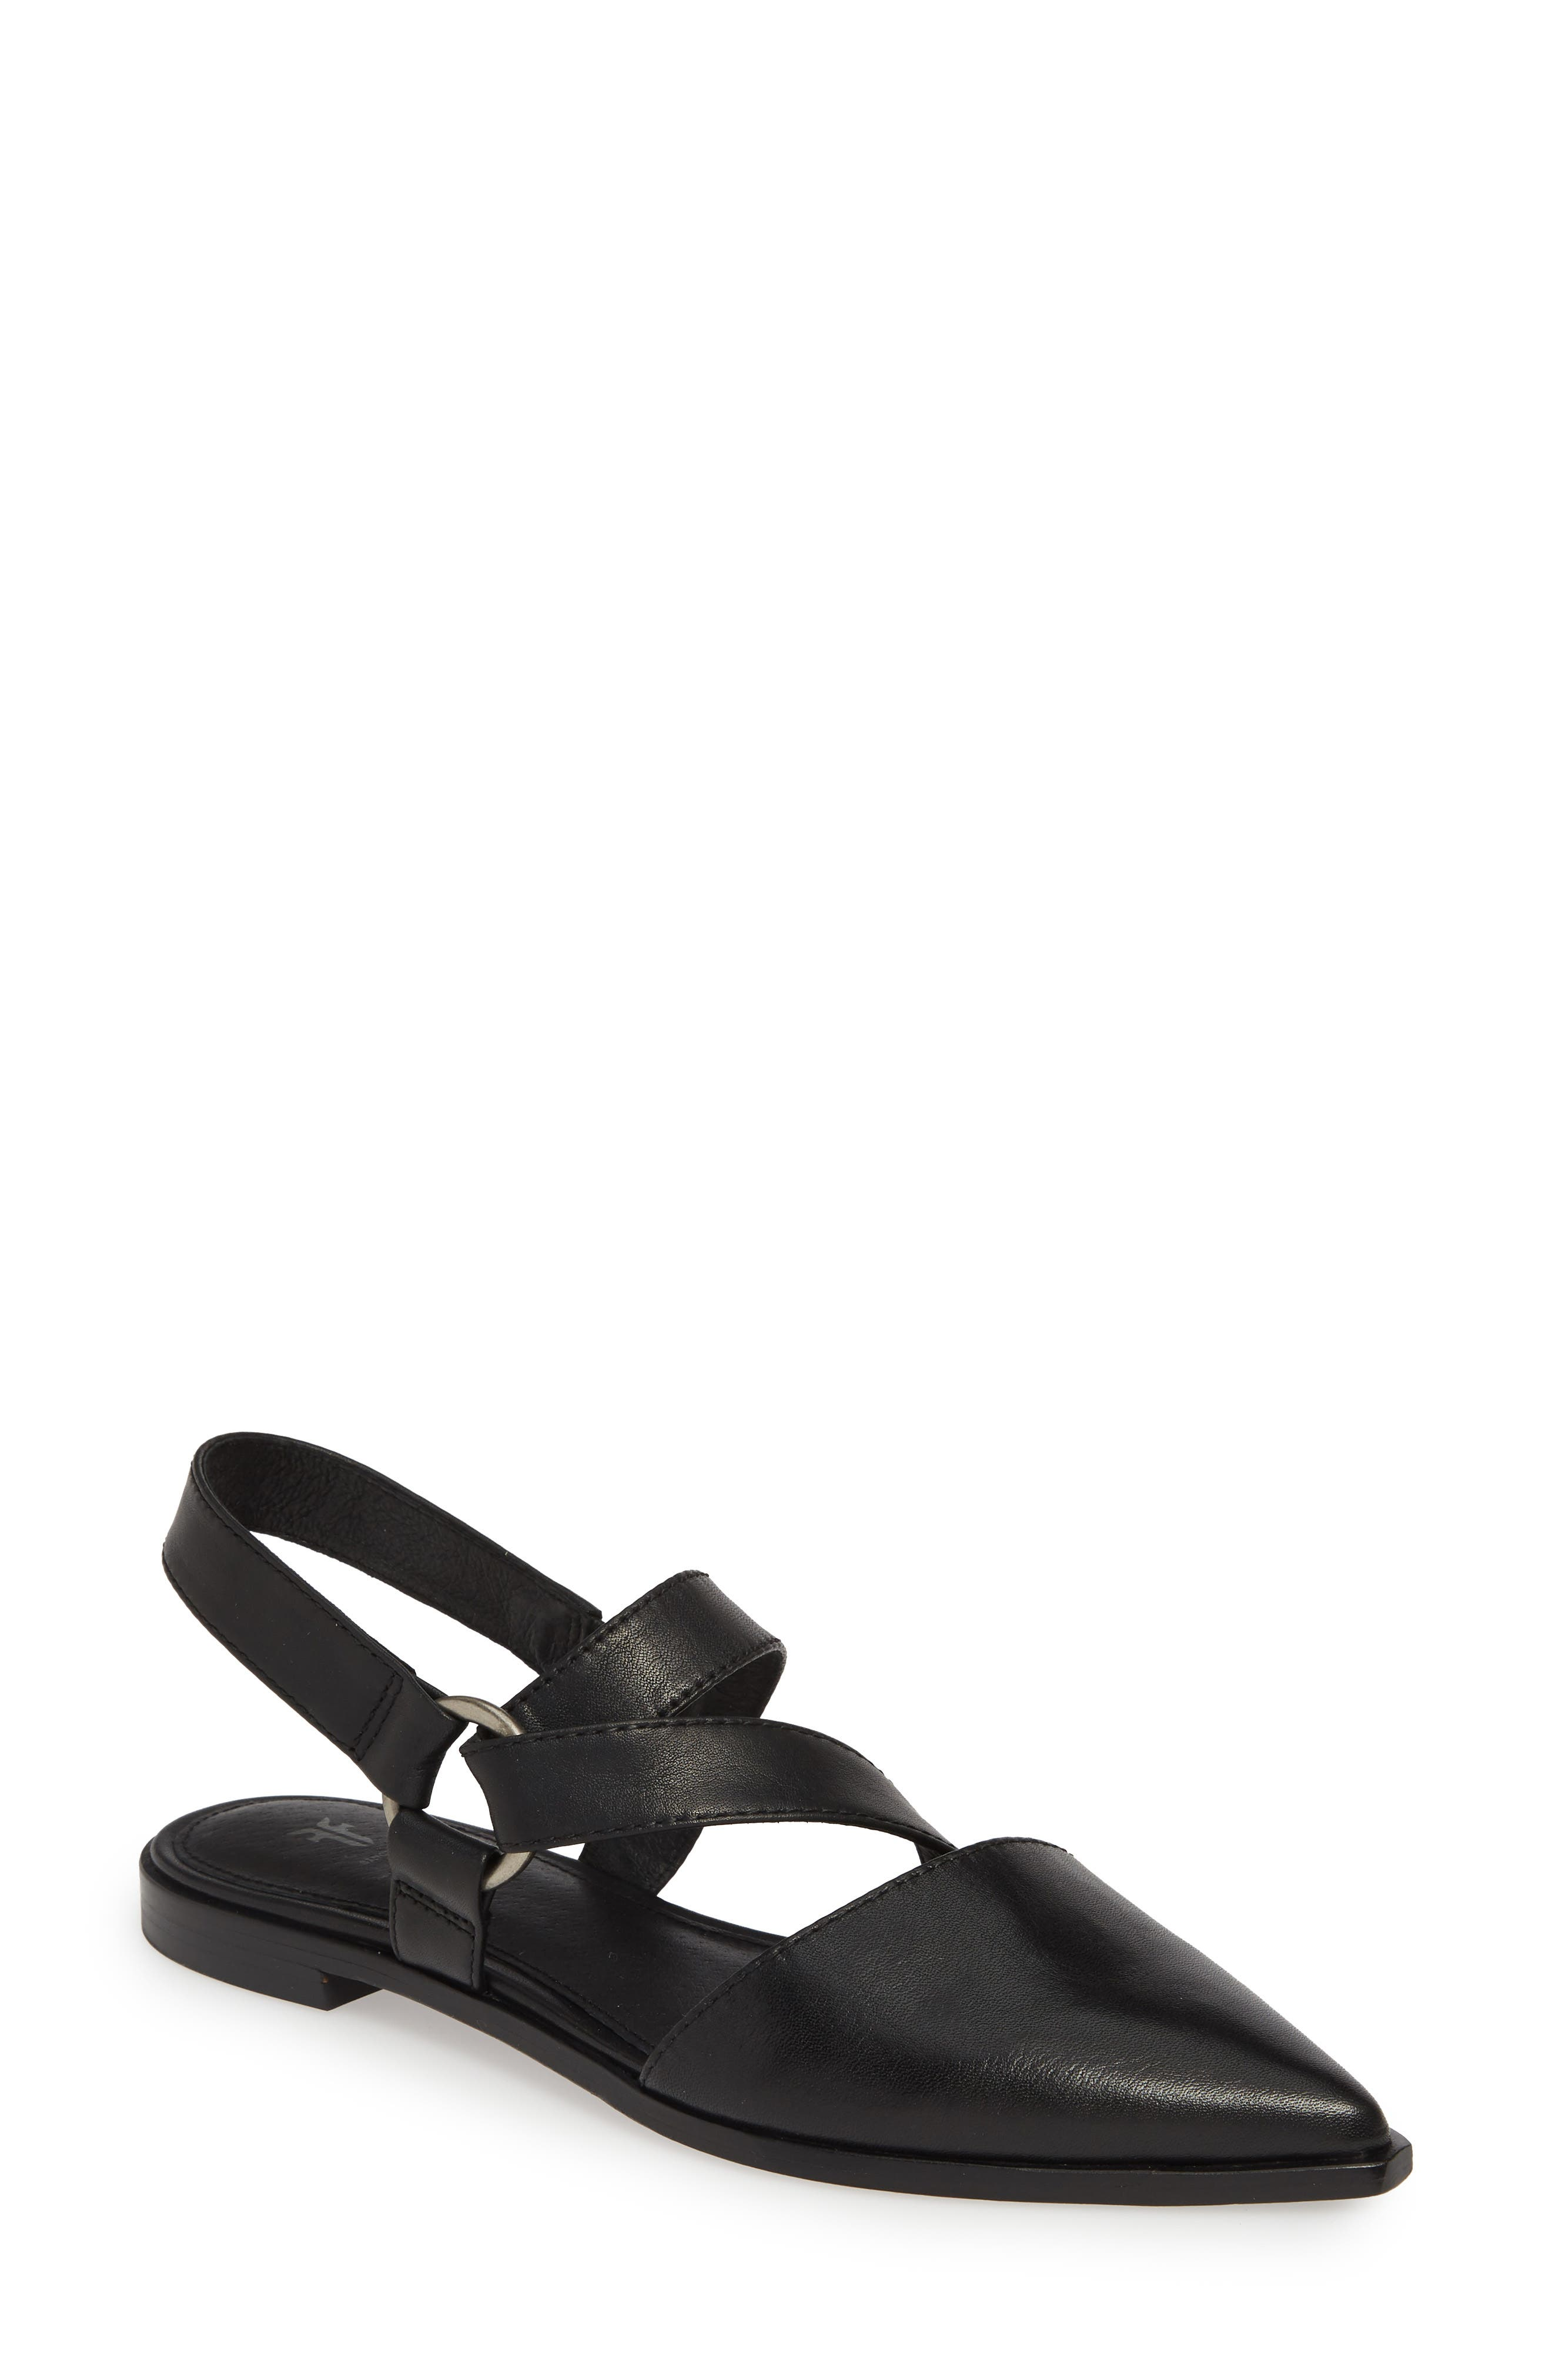 Frye Kenzie Strappy Harness Flat, Black